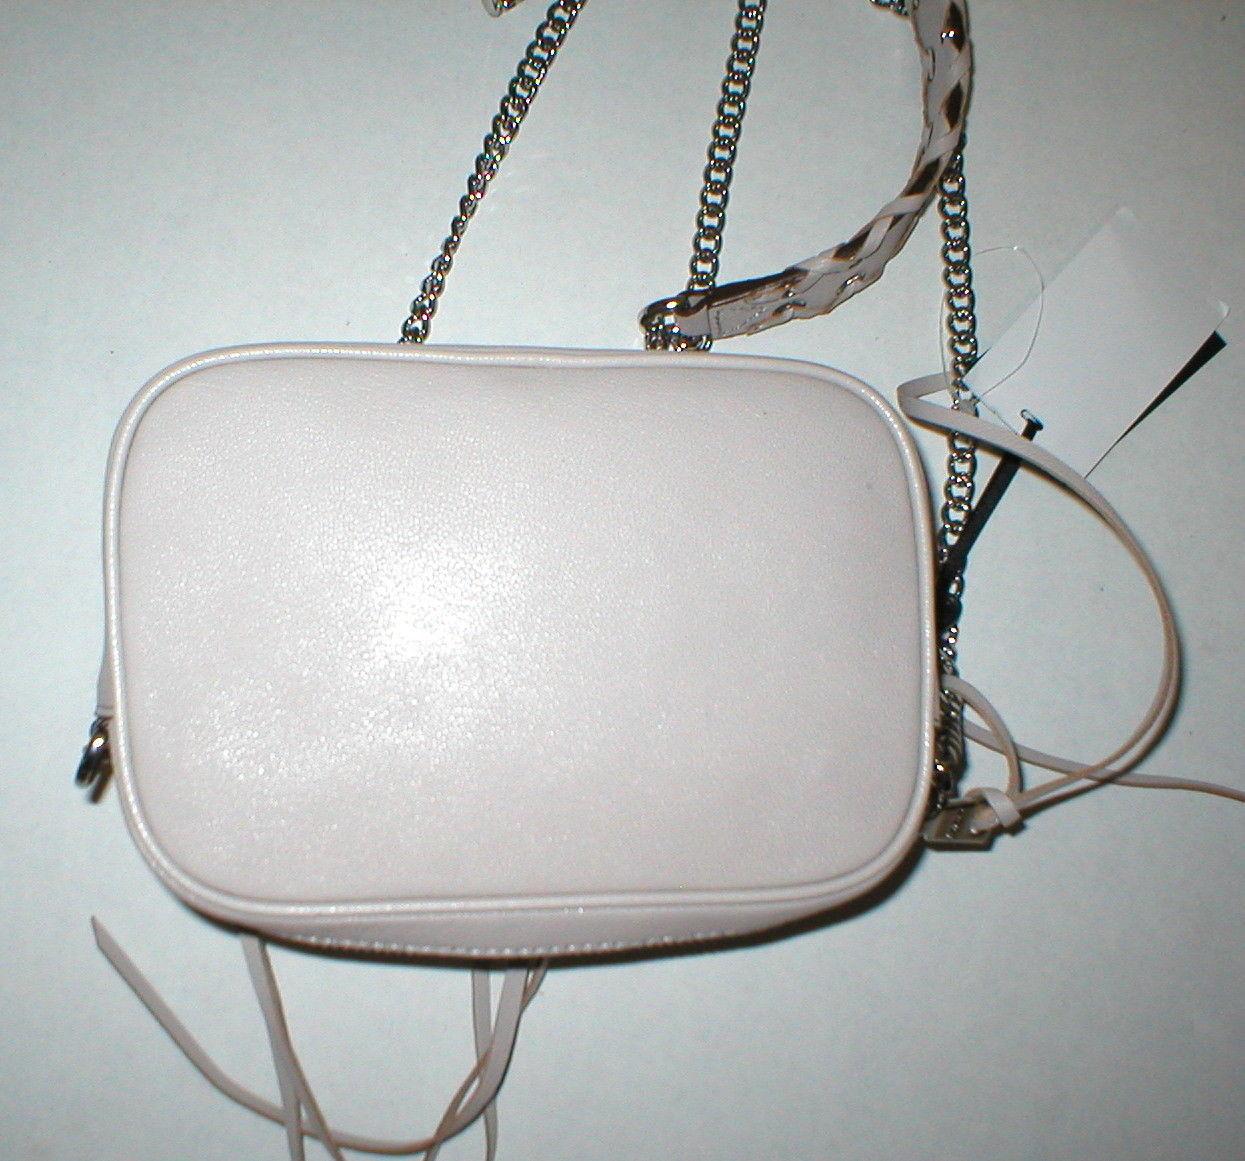 NWT New Womens DKNY Gray Stone Cross Body Bag Handbag Logo Silver Leather Chain